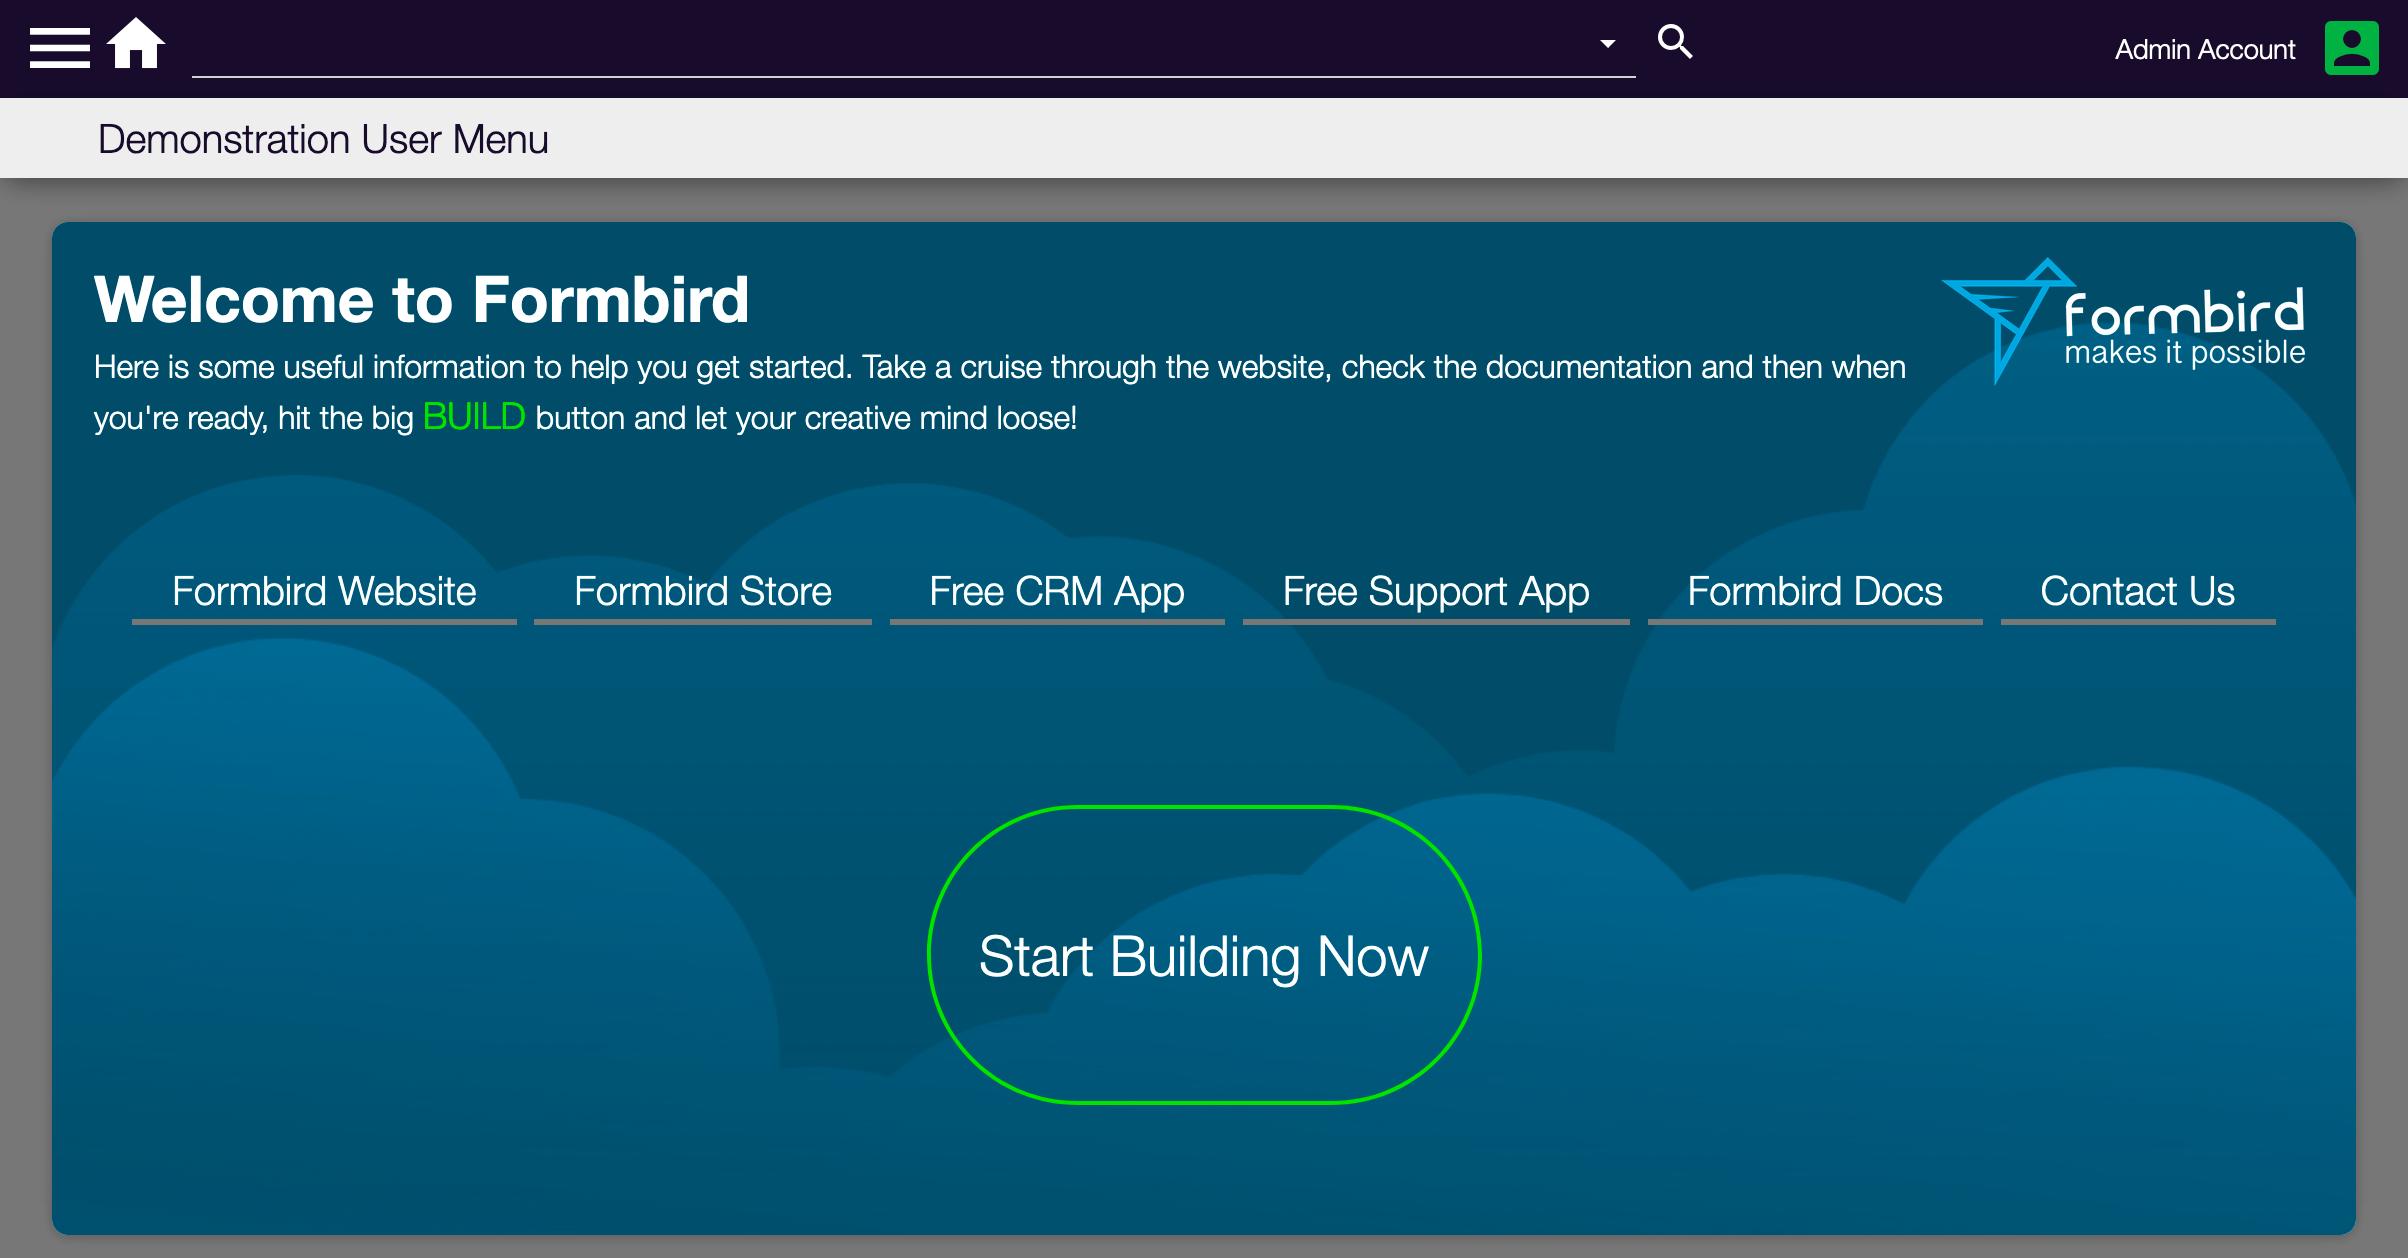 Formbird Ubuntu 18 04 / MongoDB Installation - formbird com